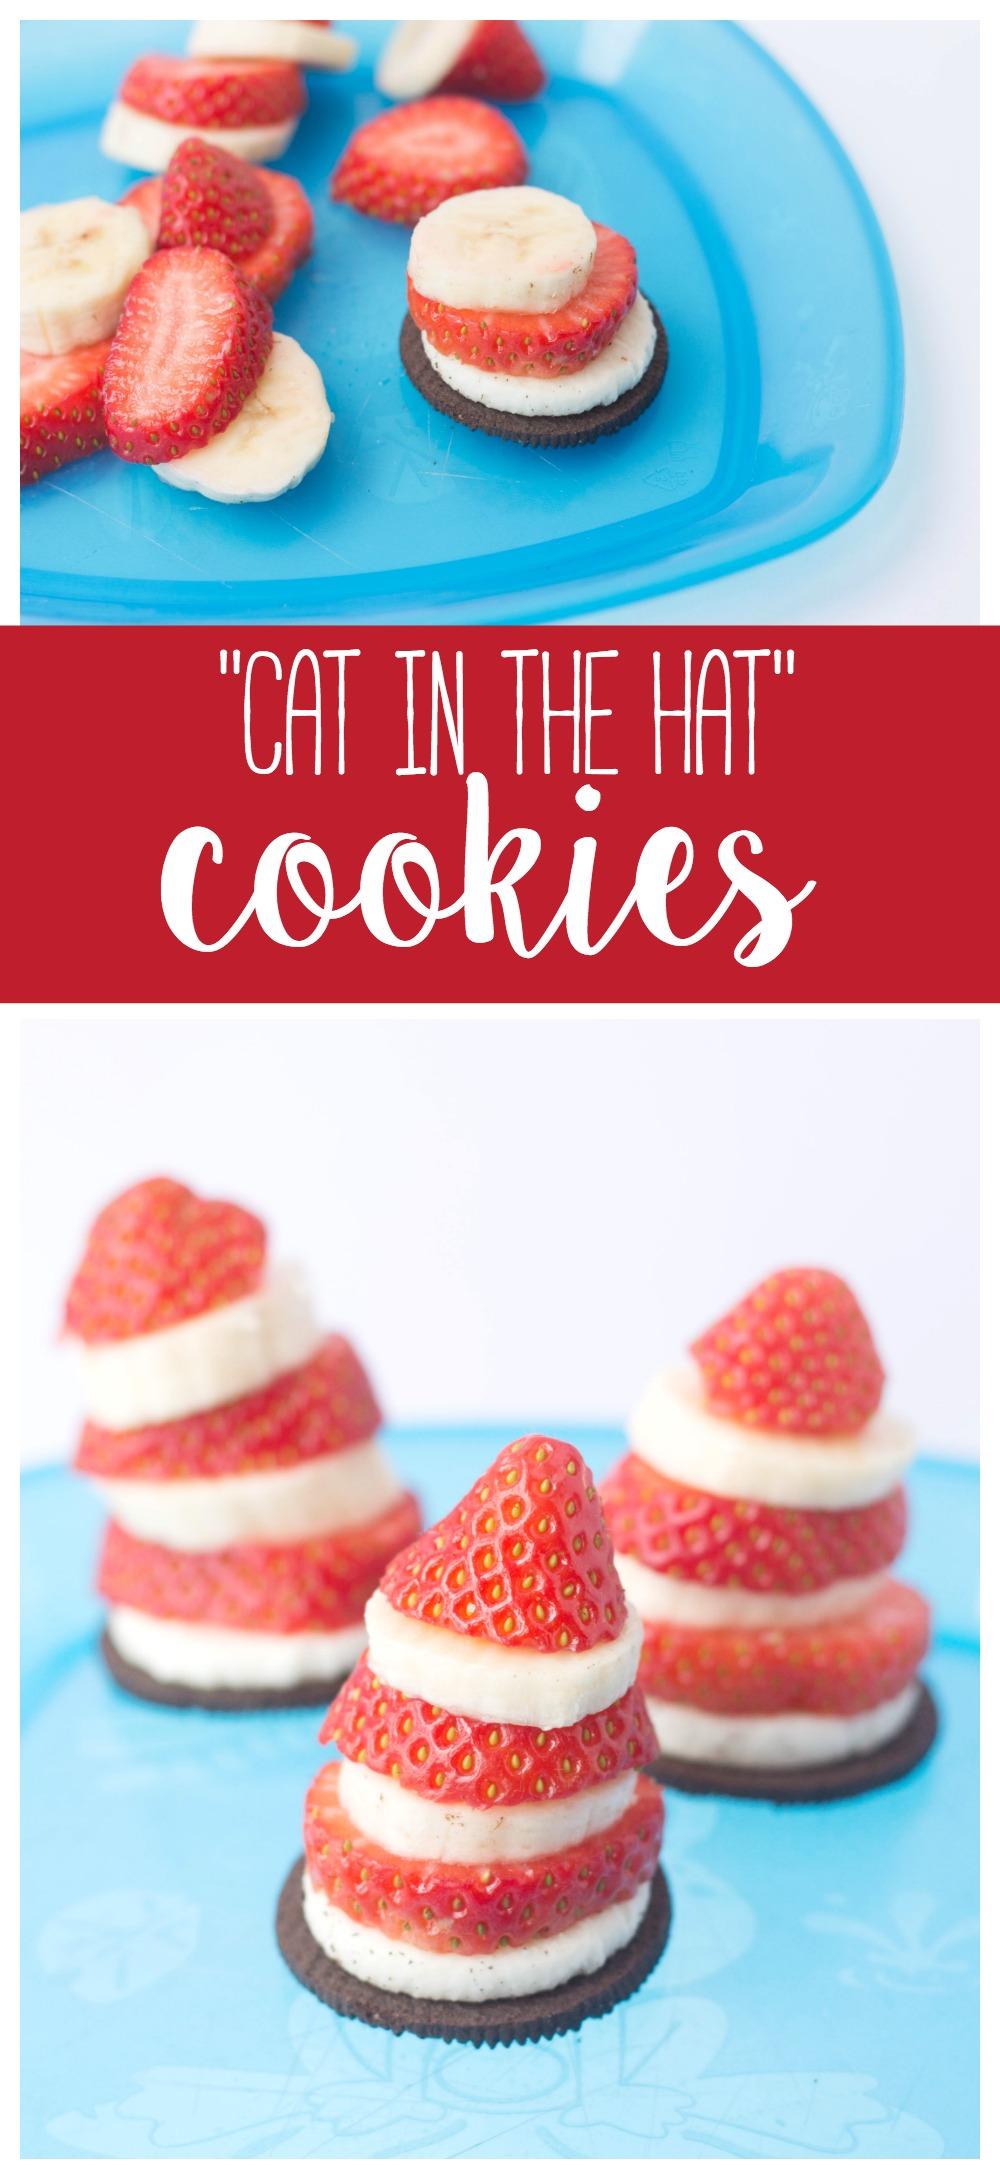 Cat in the Hat Cookies   Dr. Seuss   Kids Treat   Healthy Snack